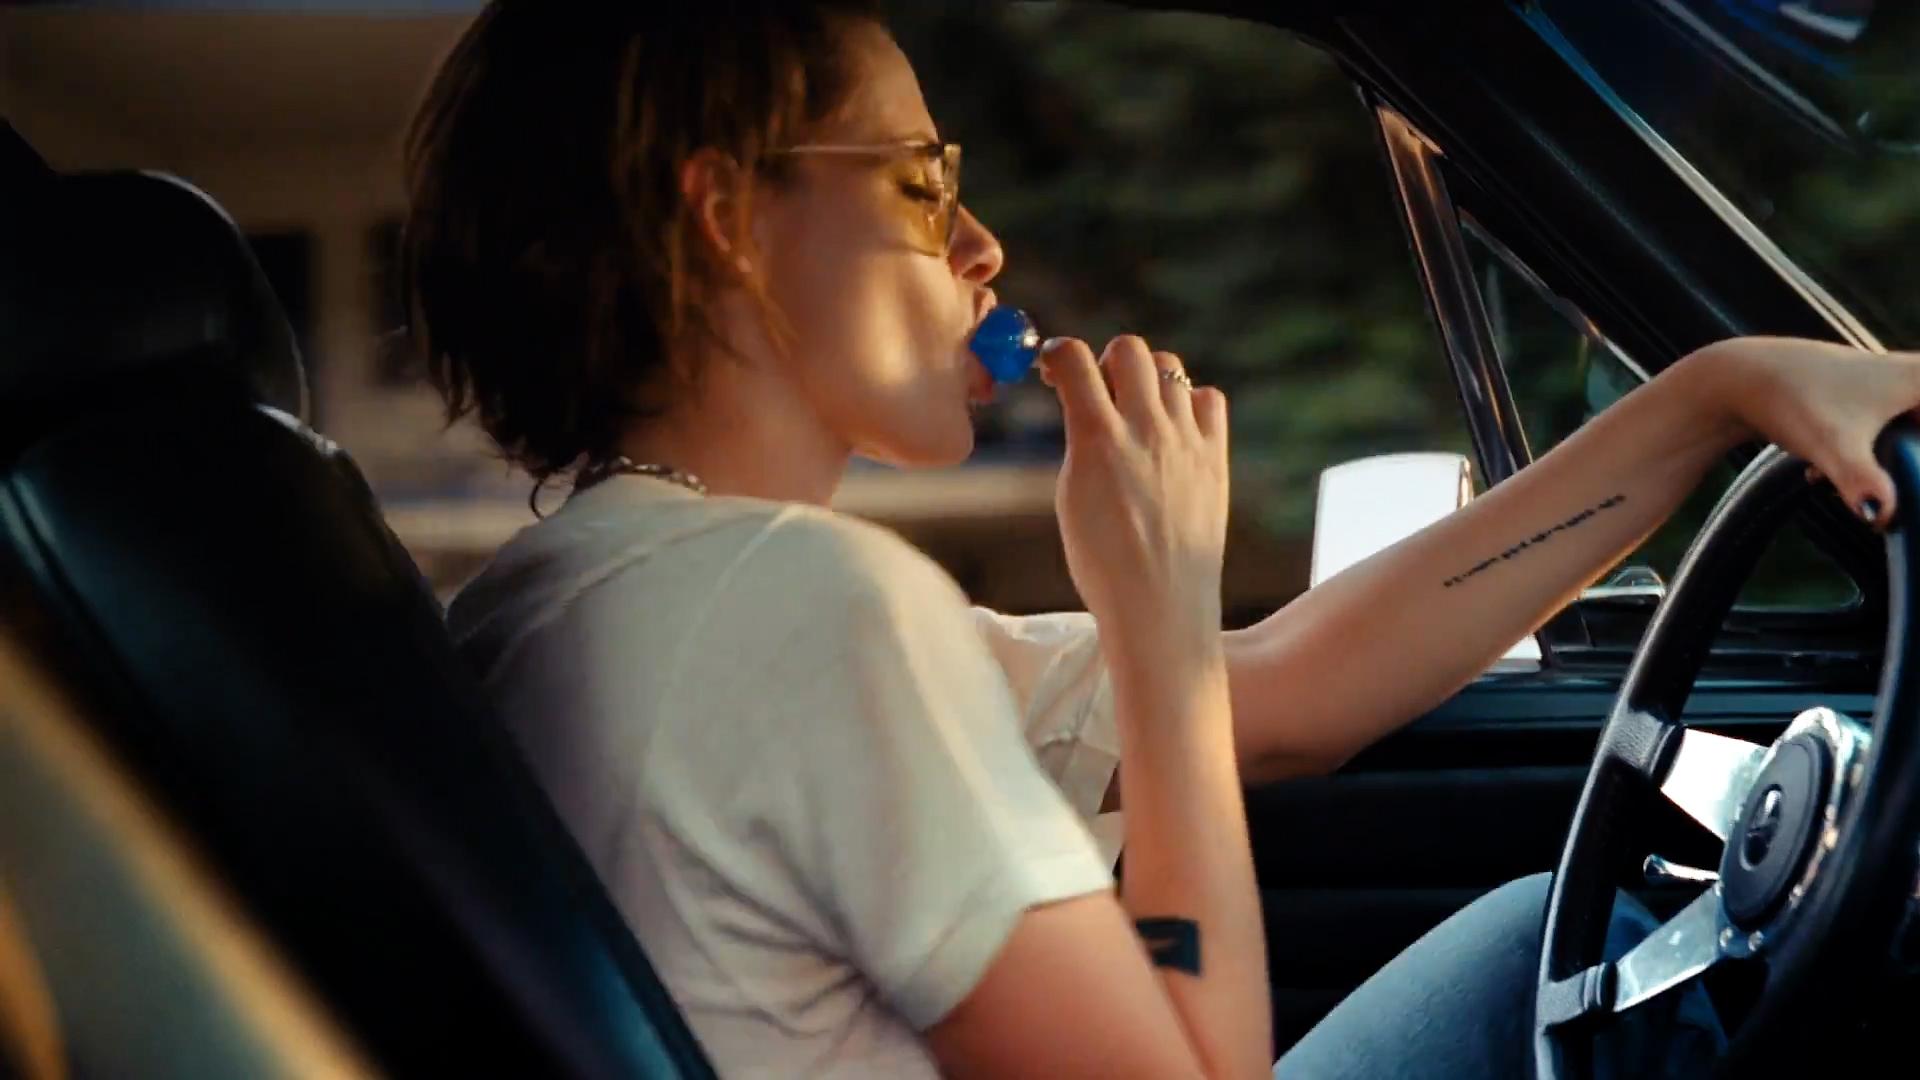 Kristen Stewart hot sexy nipple slip - The Rolling Stones - Ride 'Em On Down (9)